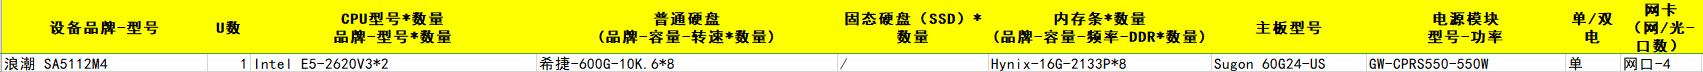 浪潮 SA5112M4 Intel E5-2620V3*2 希捷-600G-10K.6*8 Hynix-16G-2133P*8